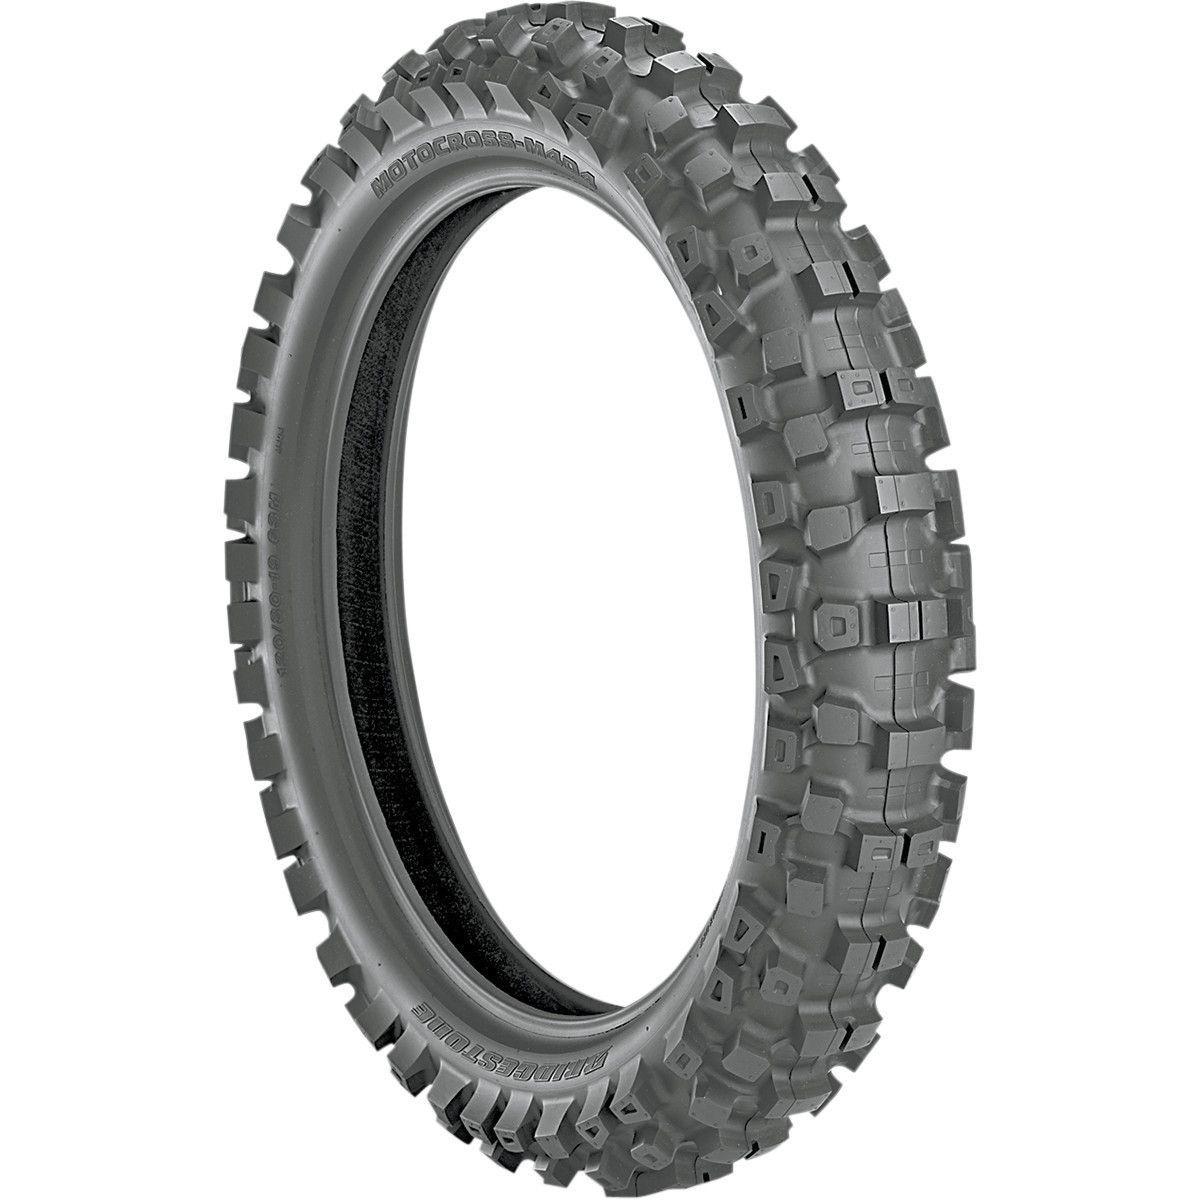 Bridgestone M404 Rear Motocross Tire 80 100 12 0313 0171 Motorcycle Parts And Accessories Bridgestone Tires Motocross